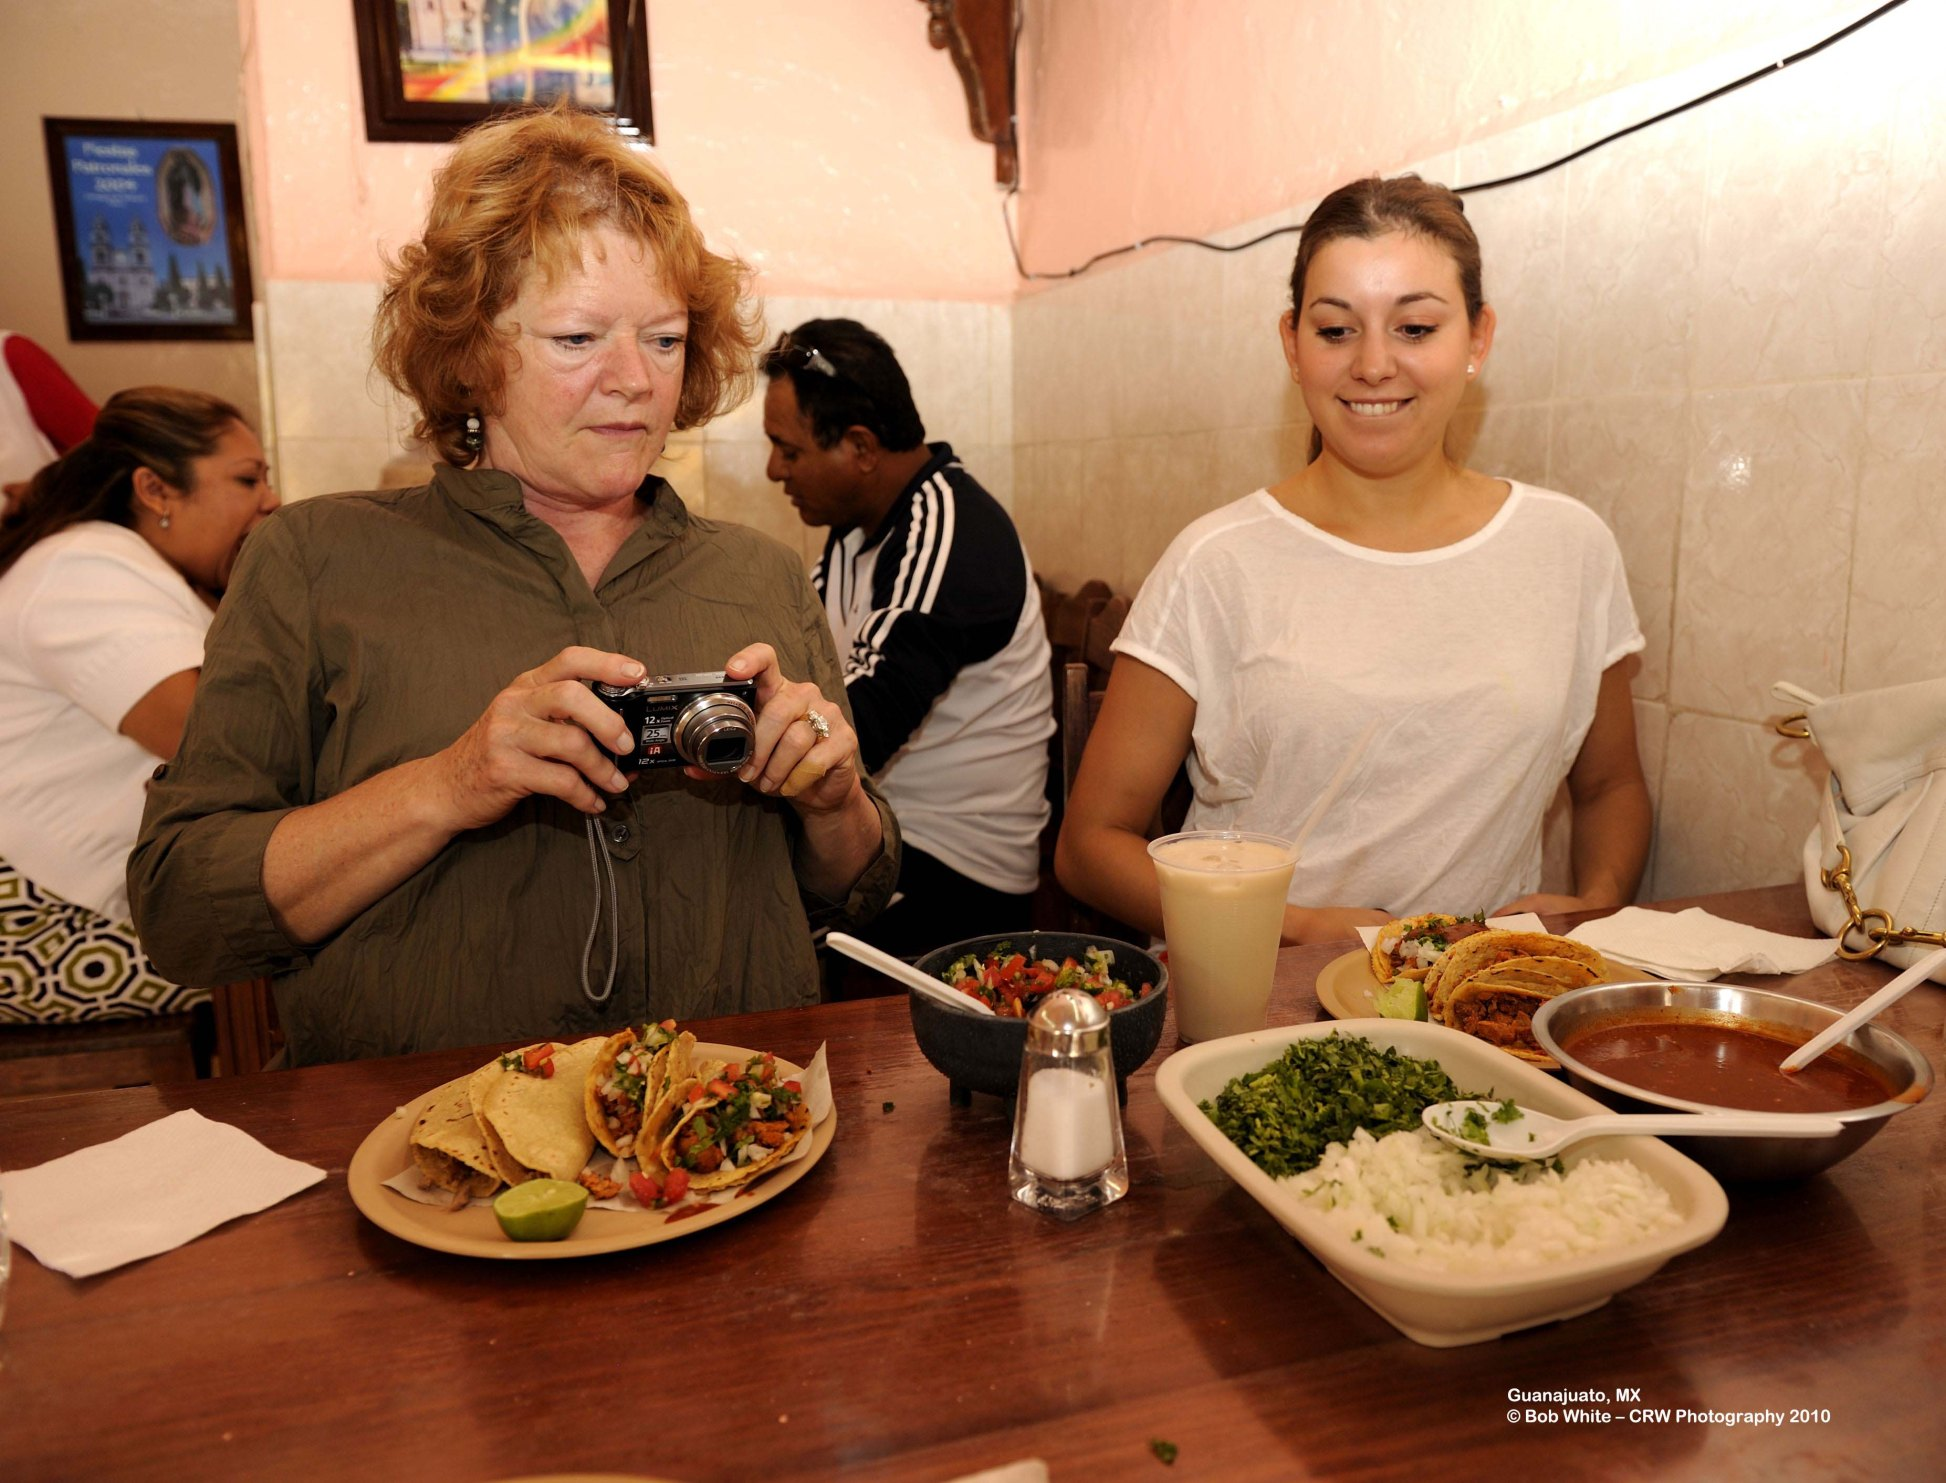 96 Sharon photos her food